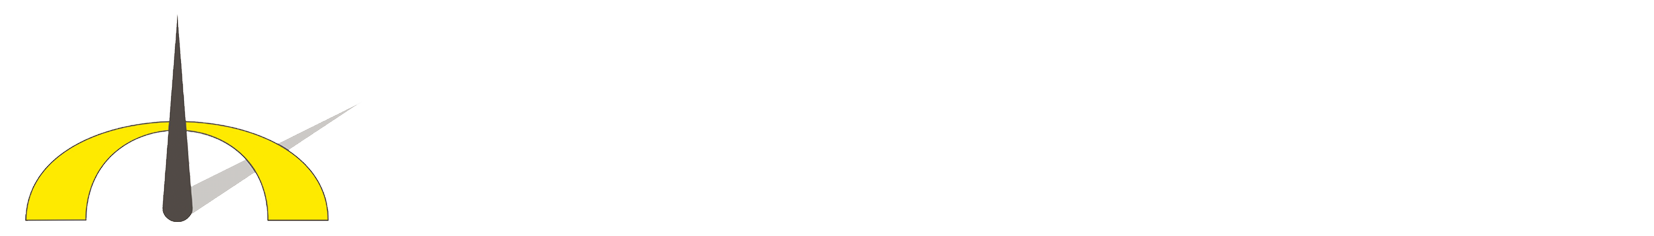 Bollmann & Reiff GbR